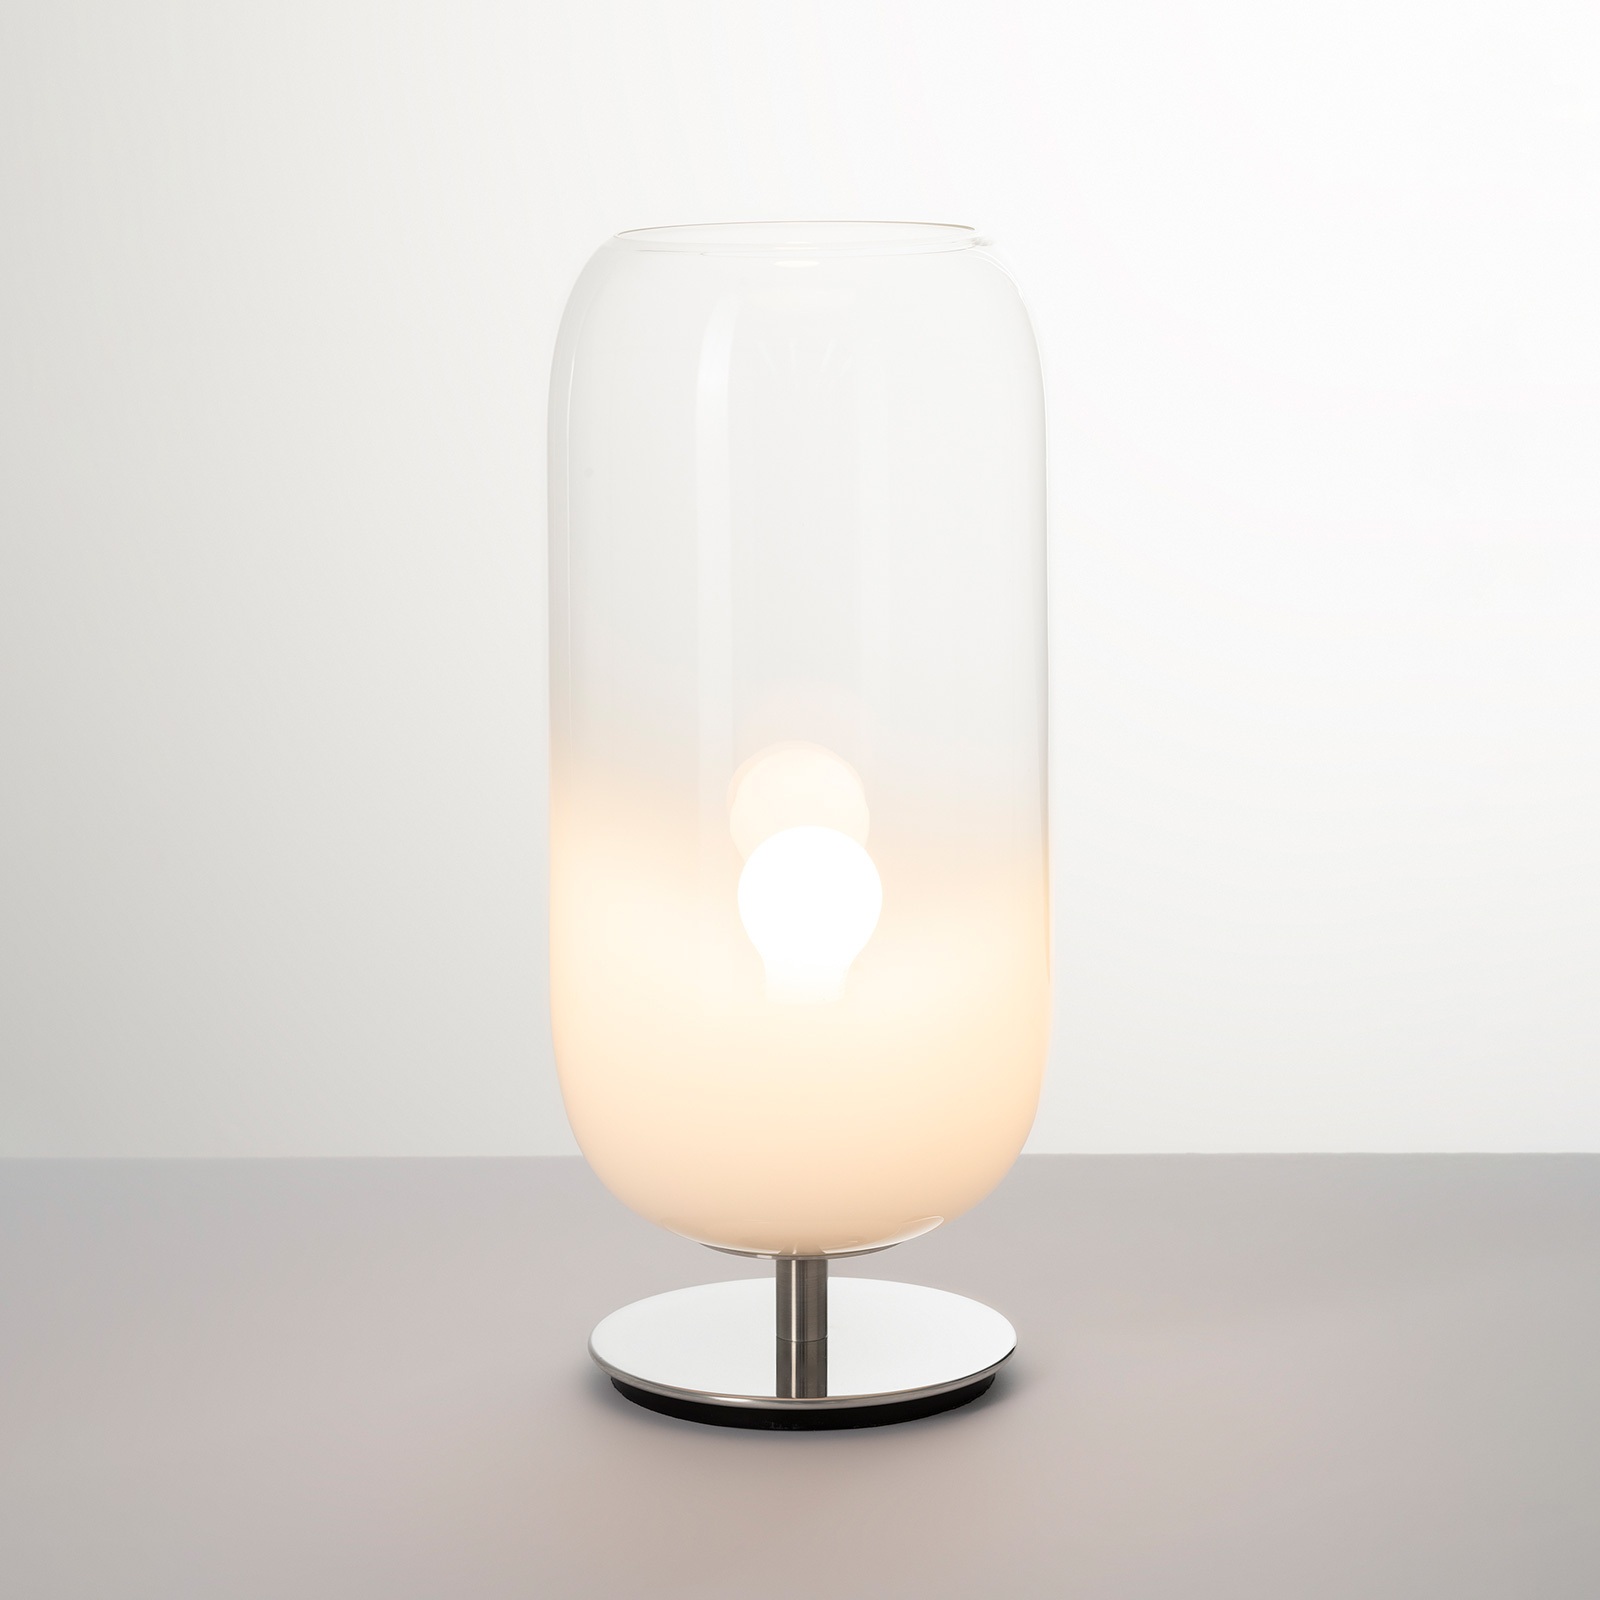 Acquista Artemide Gople Mini lampada da tavolo